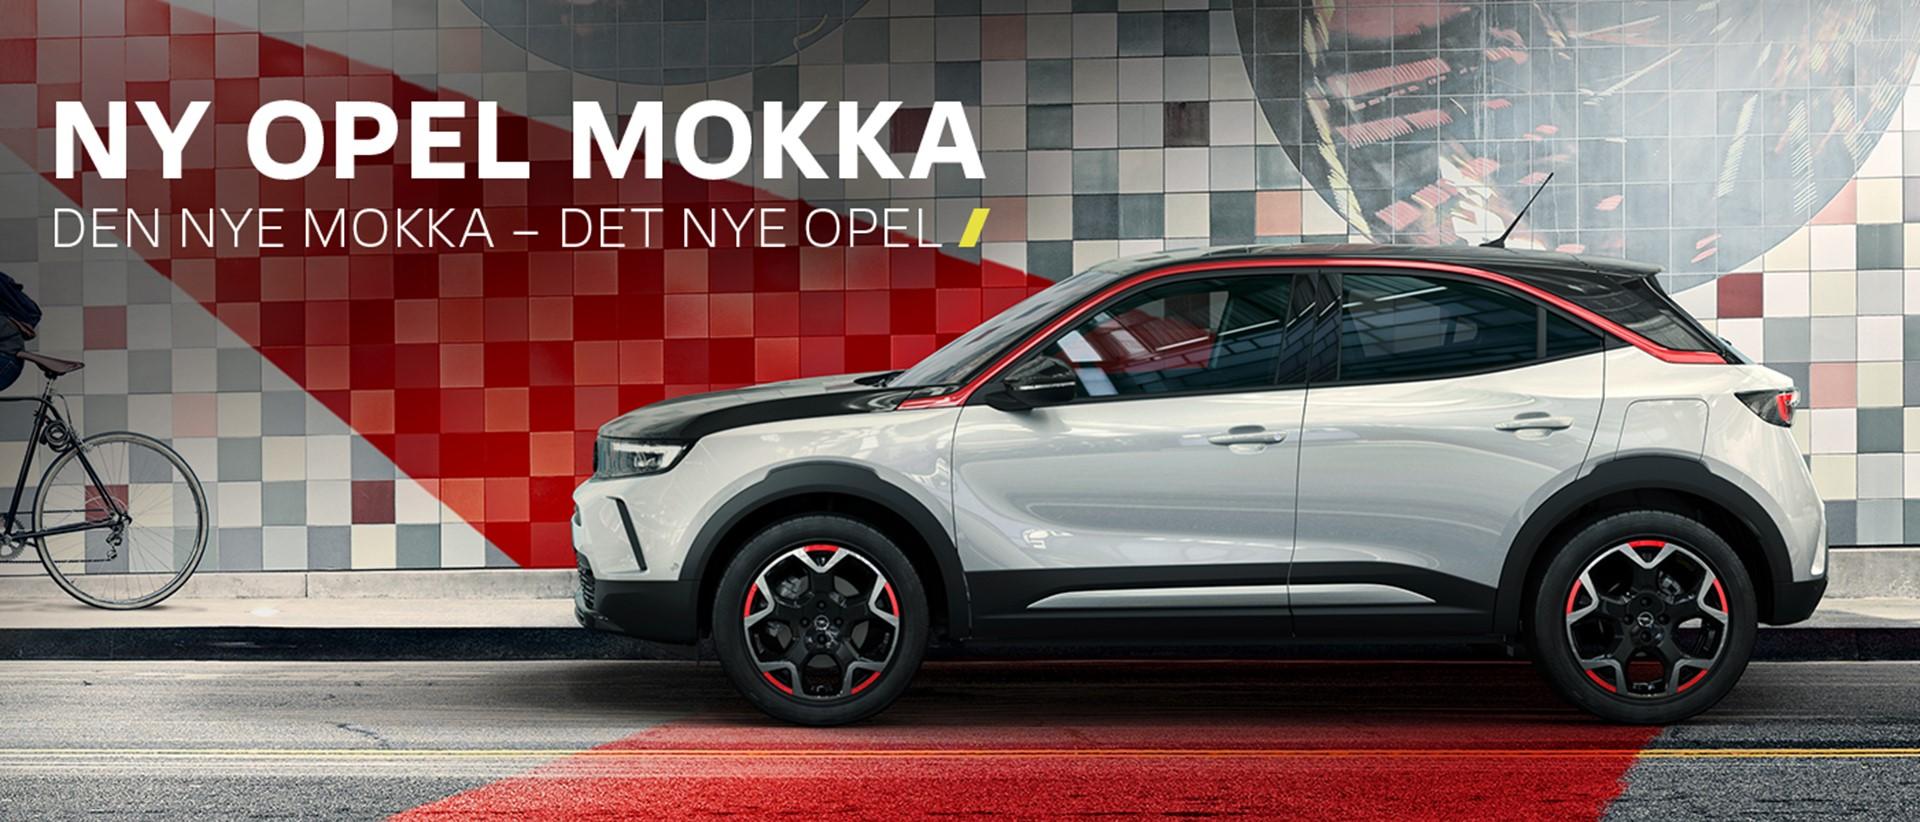 Den nye Mokka - Det nye Opel